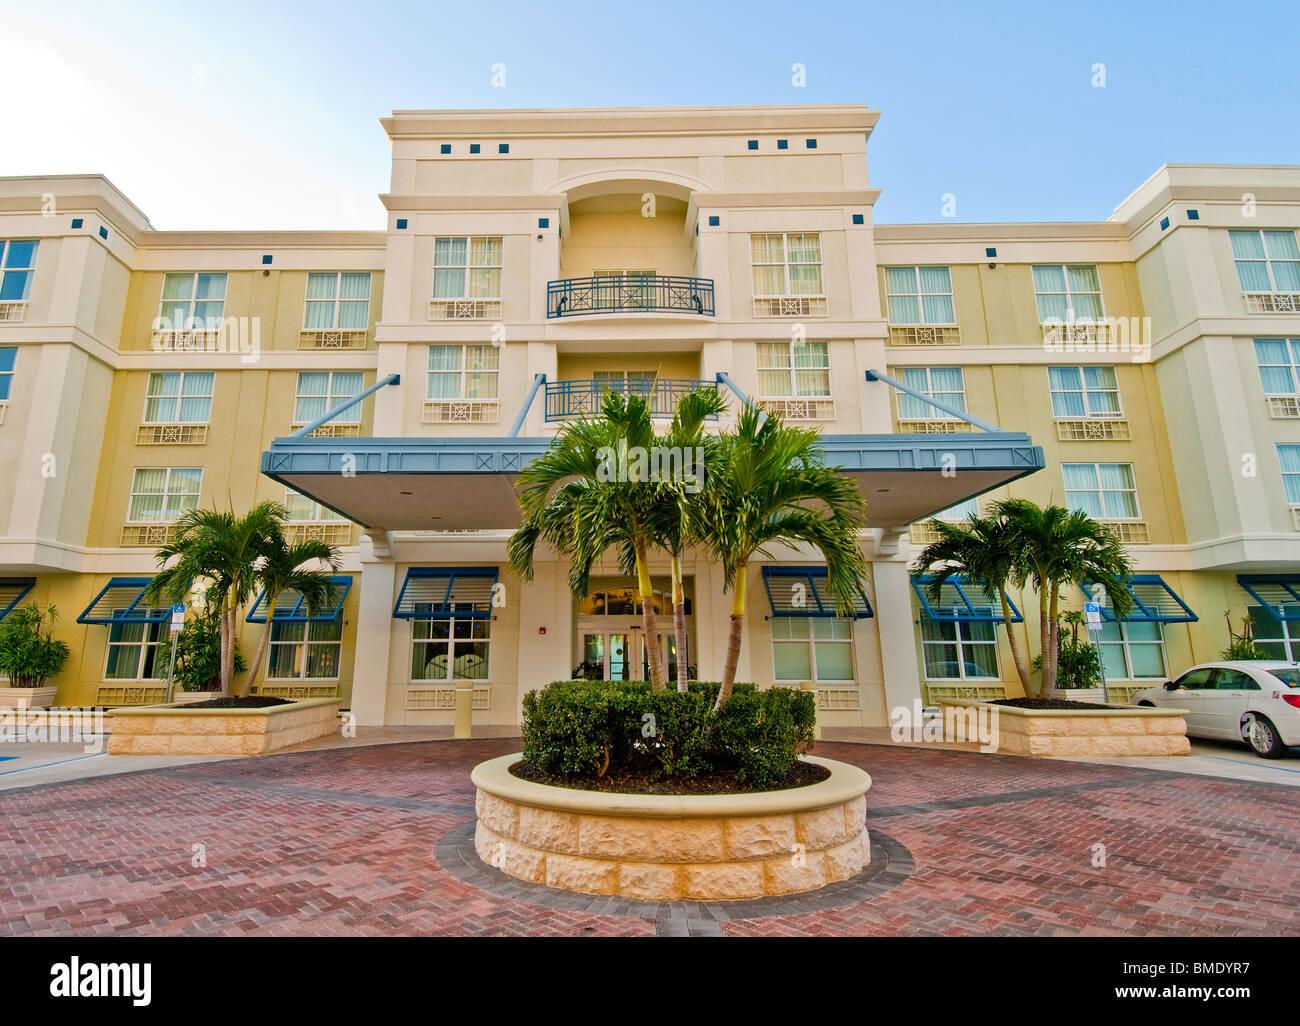 Front entrance to Hotel Indigo in Sarasota, Florida, USA - Stock Image